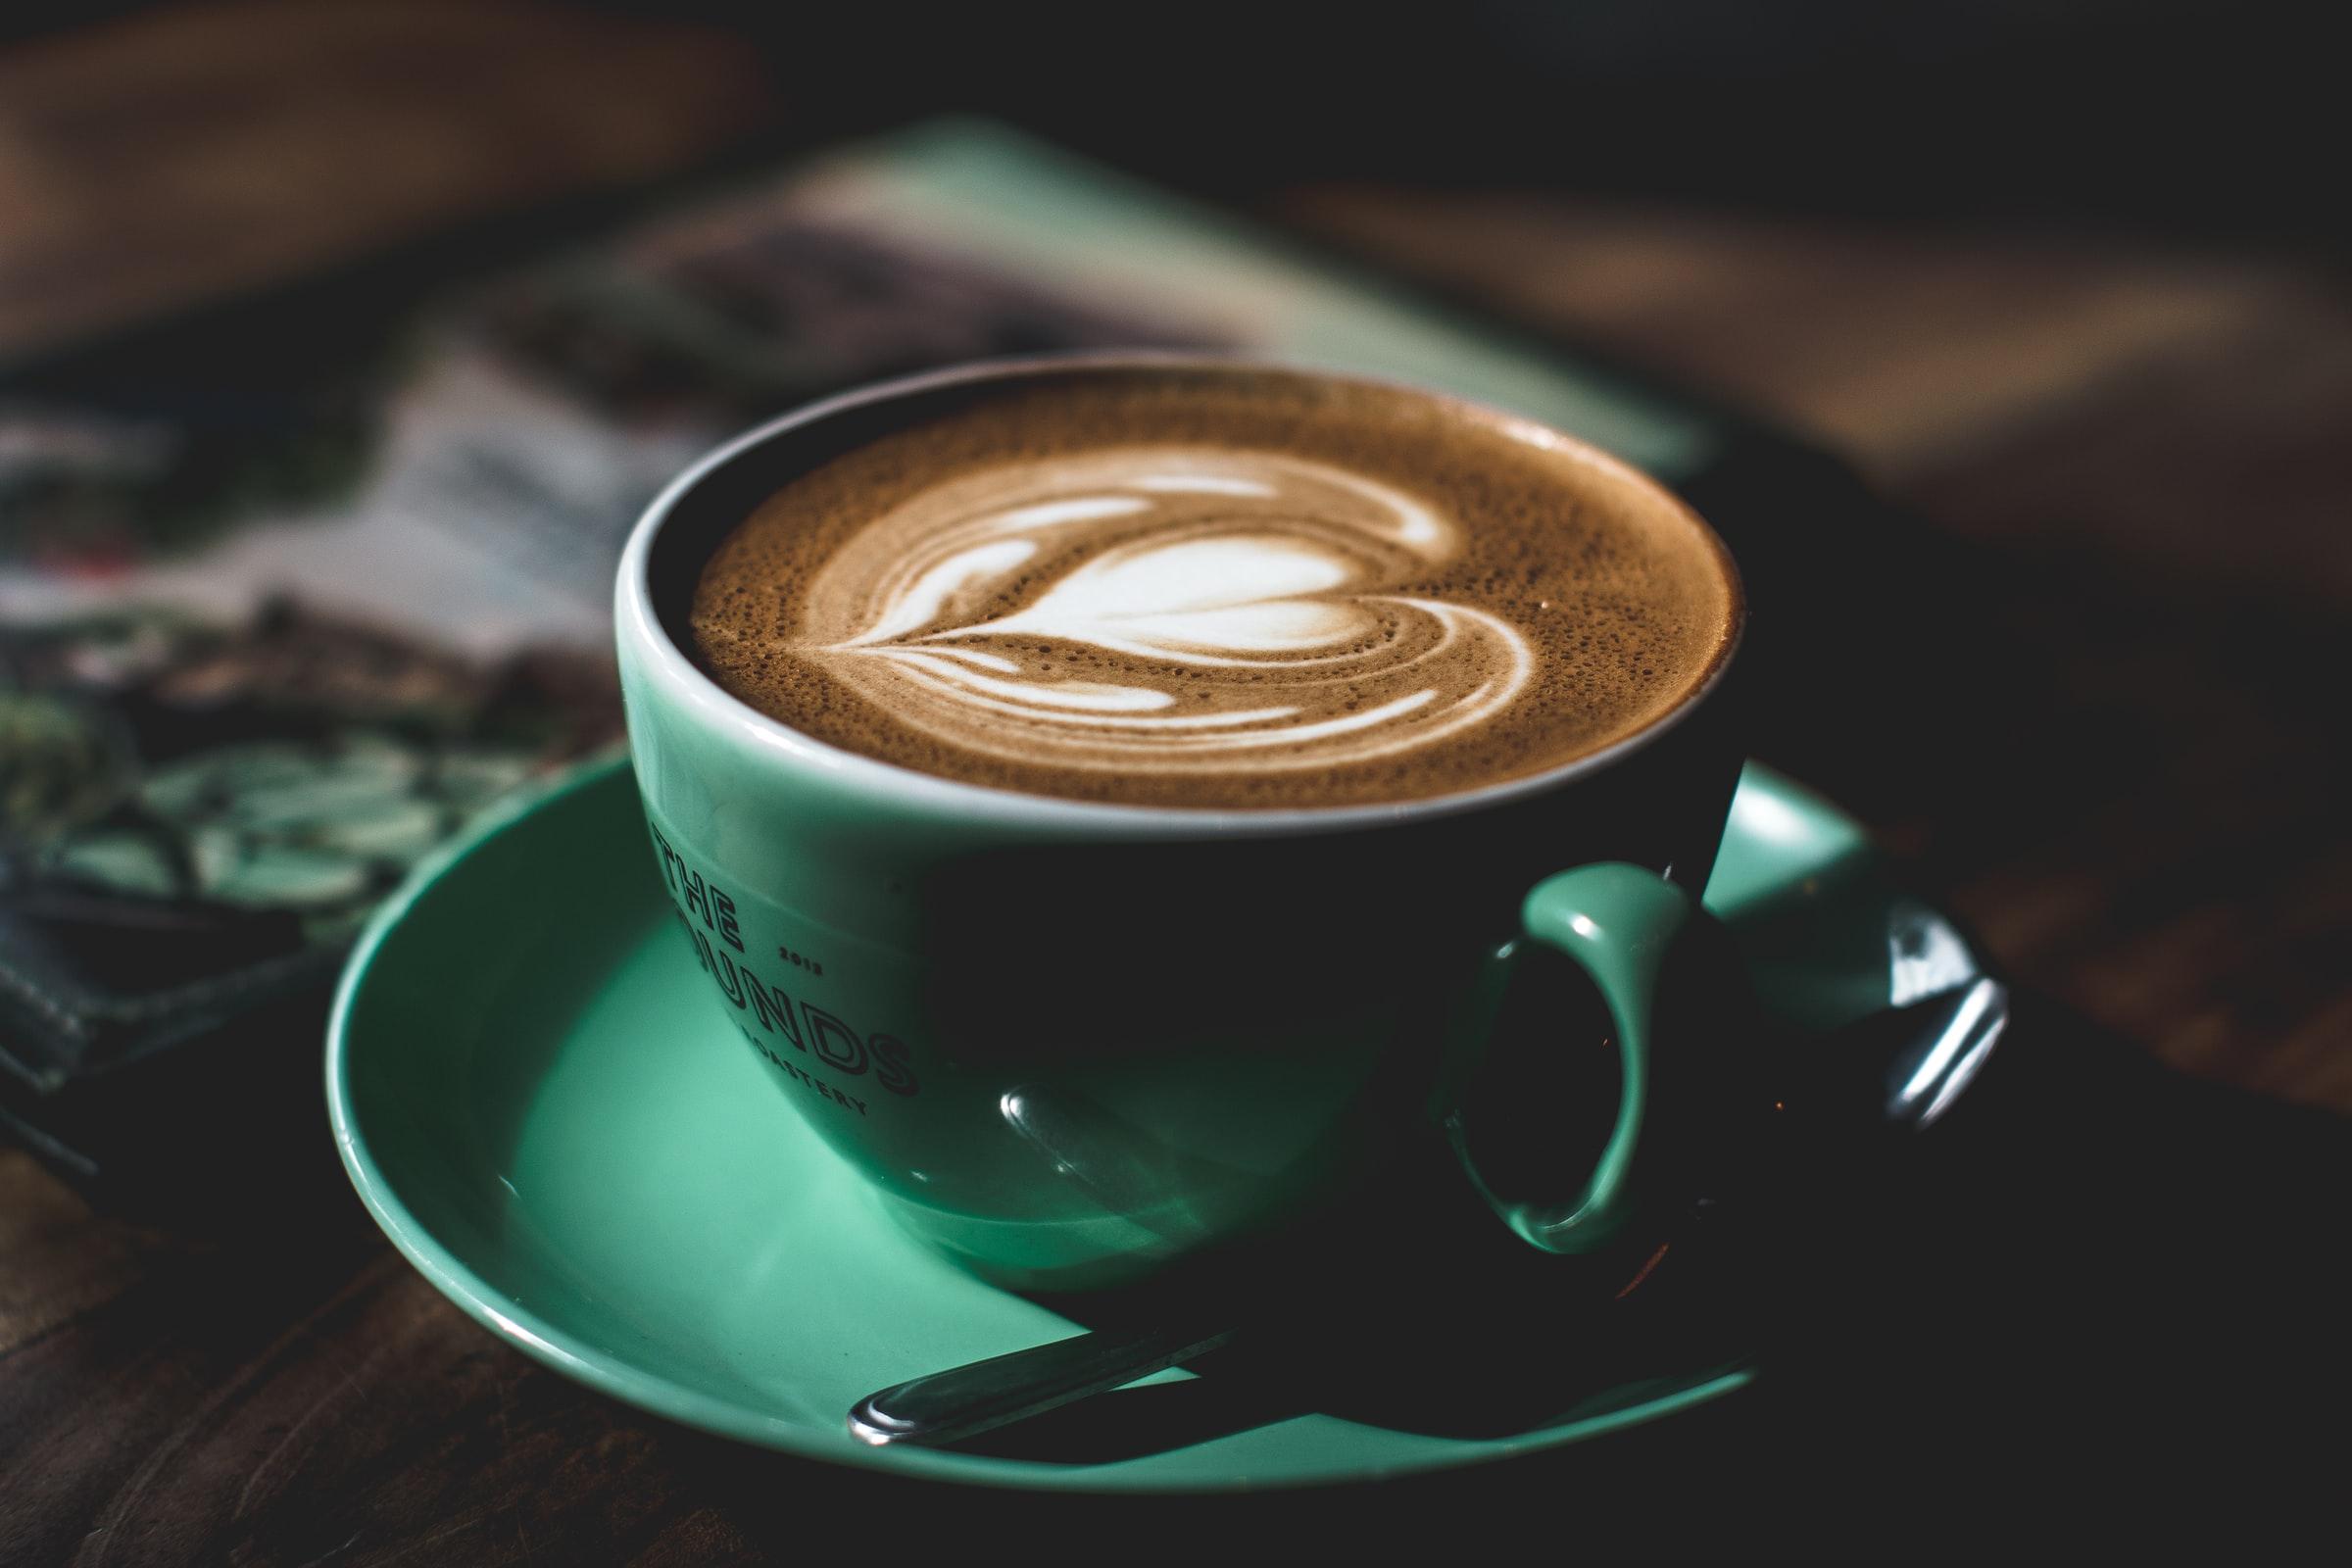 latte en taza verde